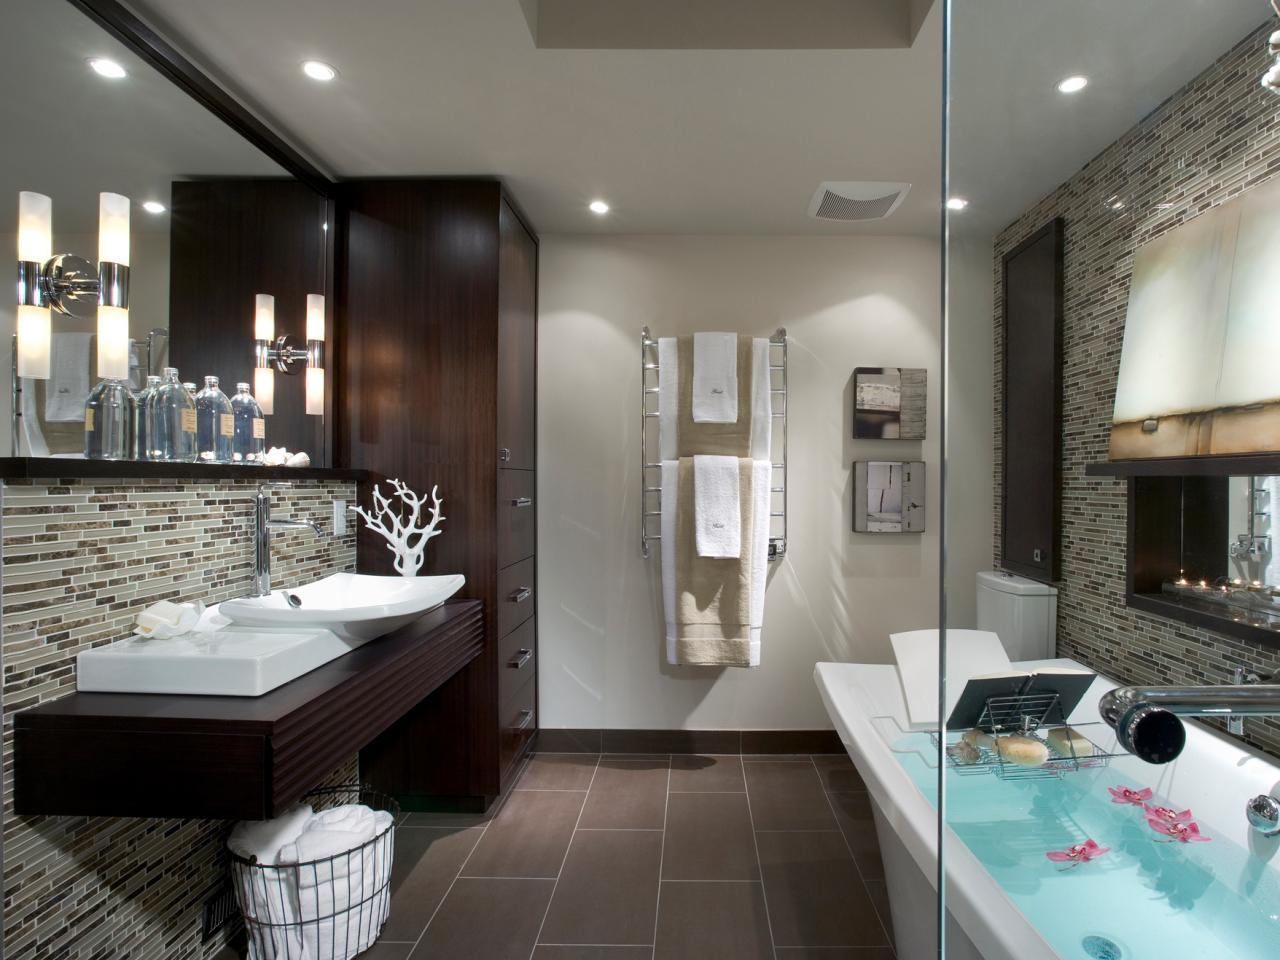 spa bathroom tile ideas photo - 2